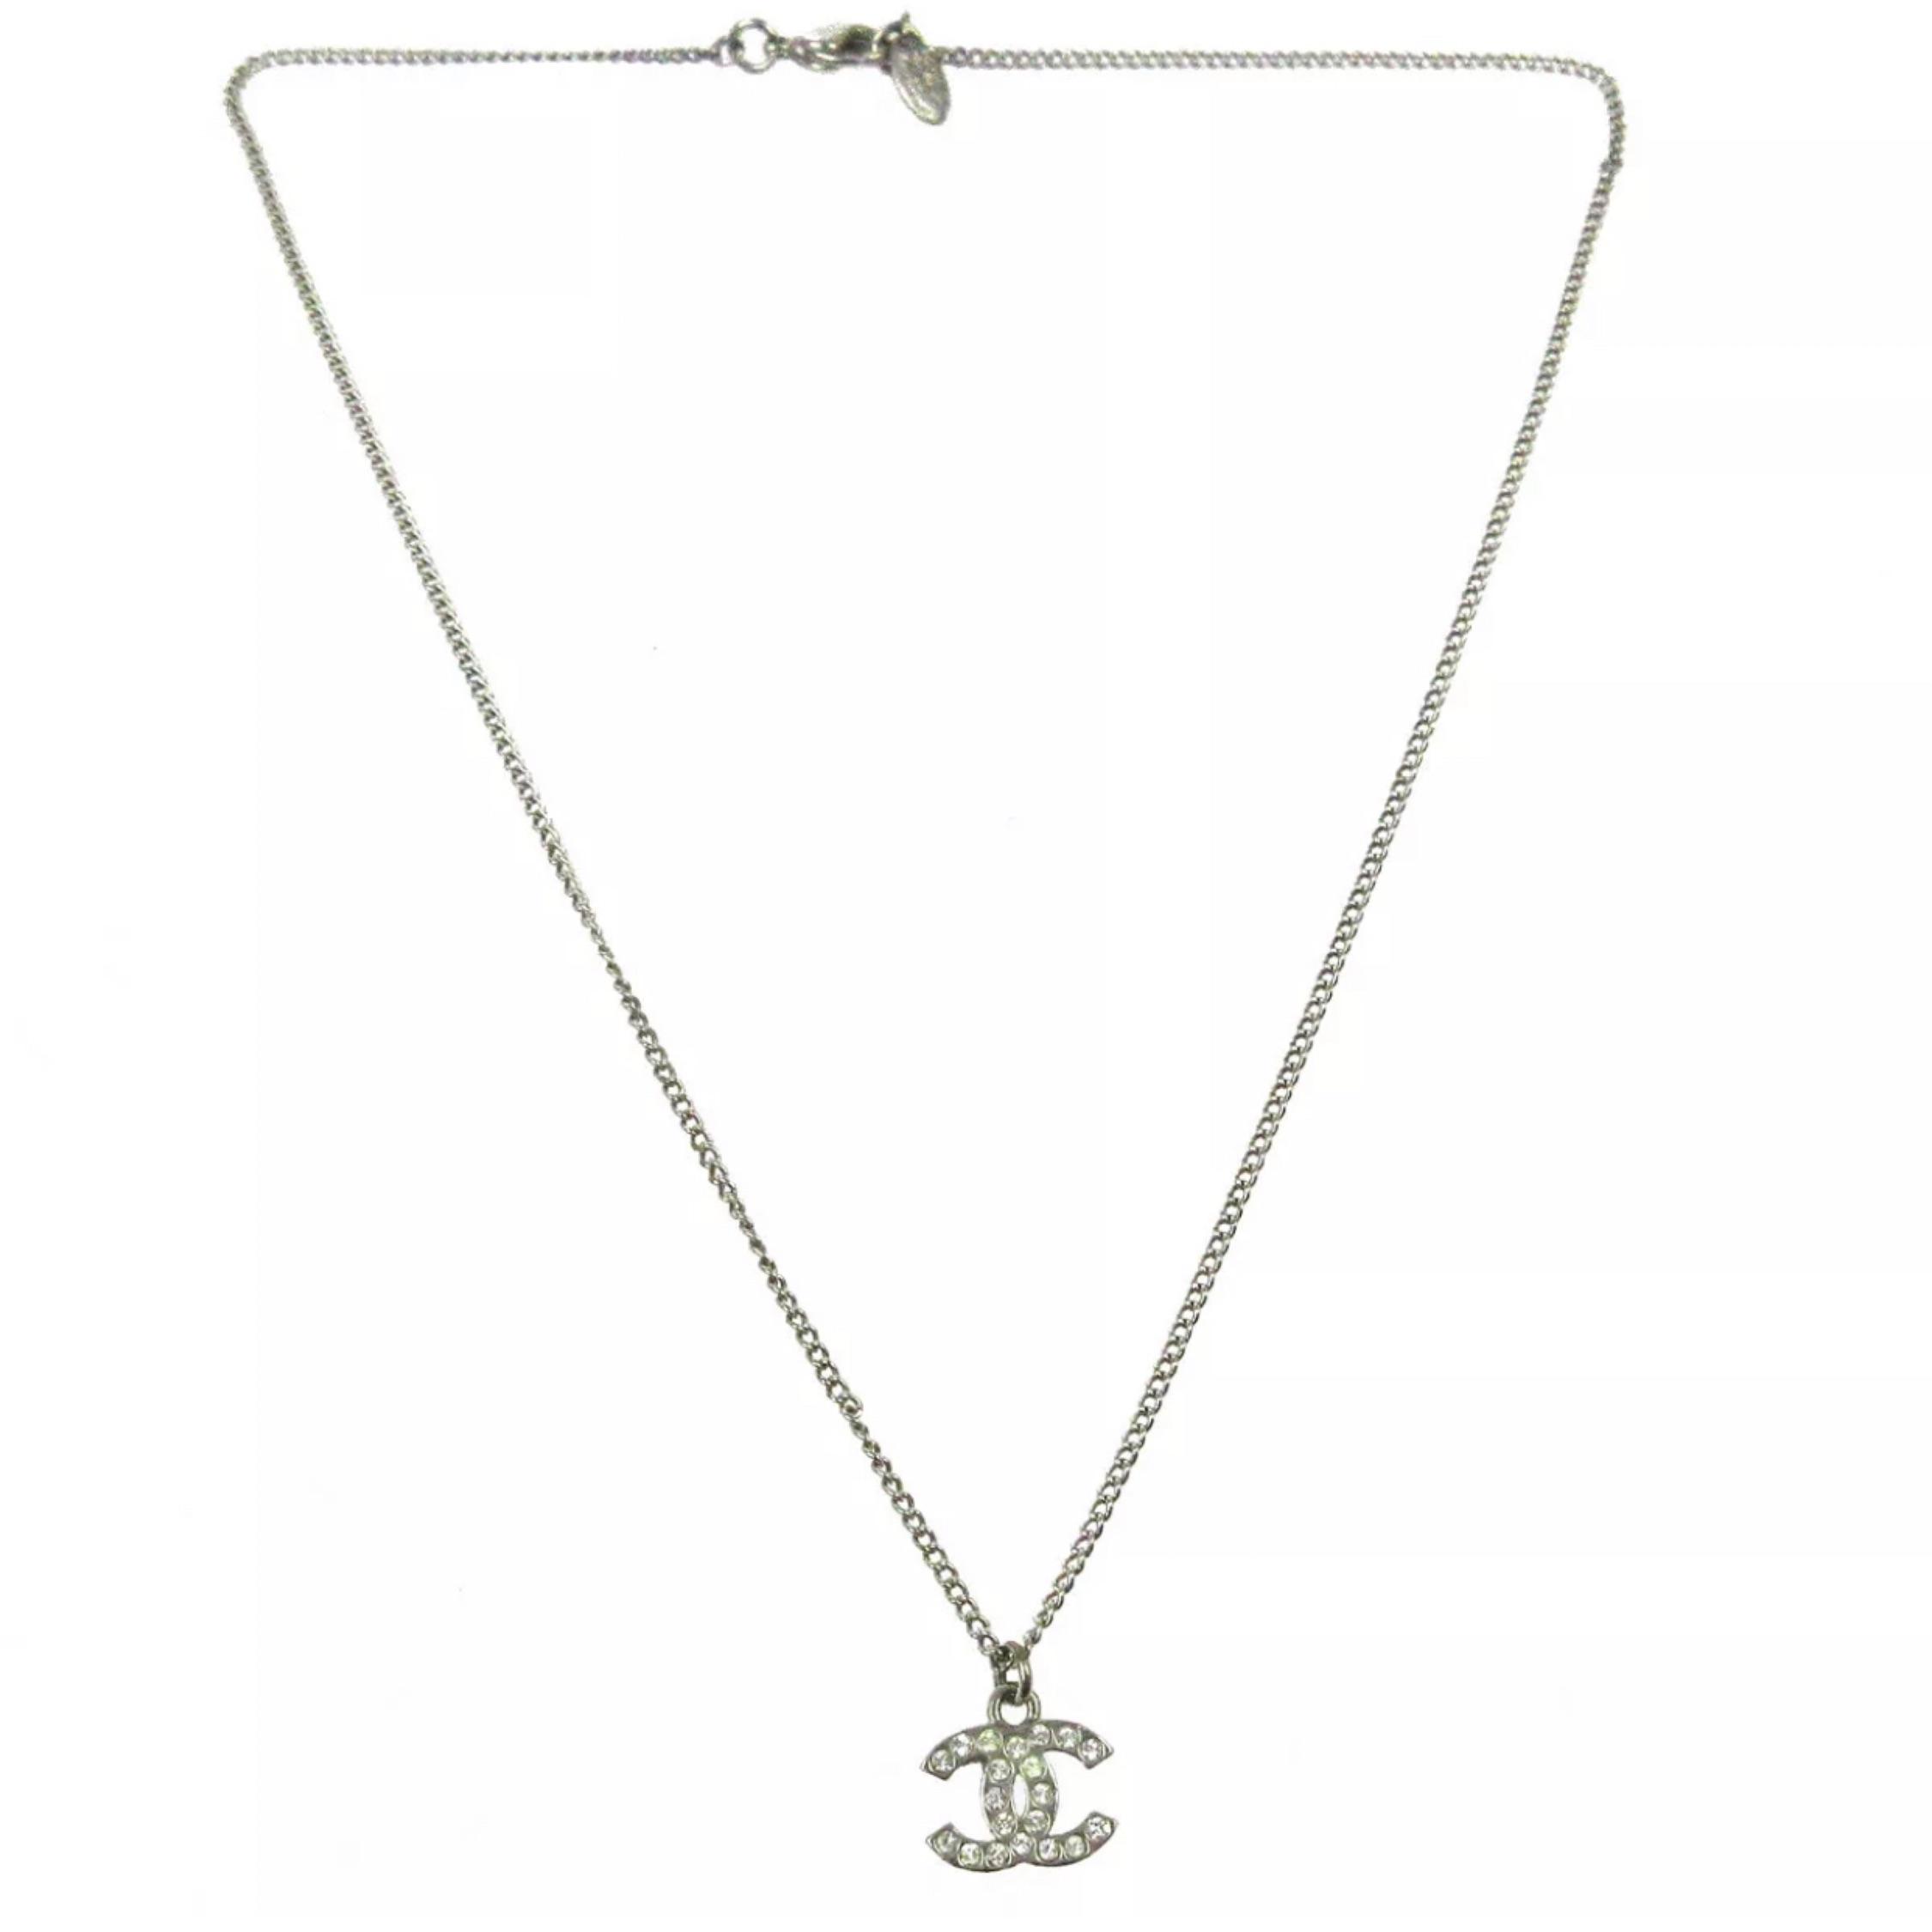 Chanel Cc Logos Rhinestone Necklace Pendant.